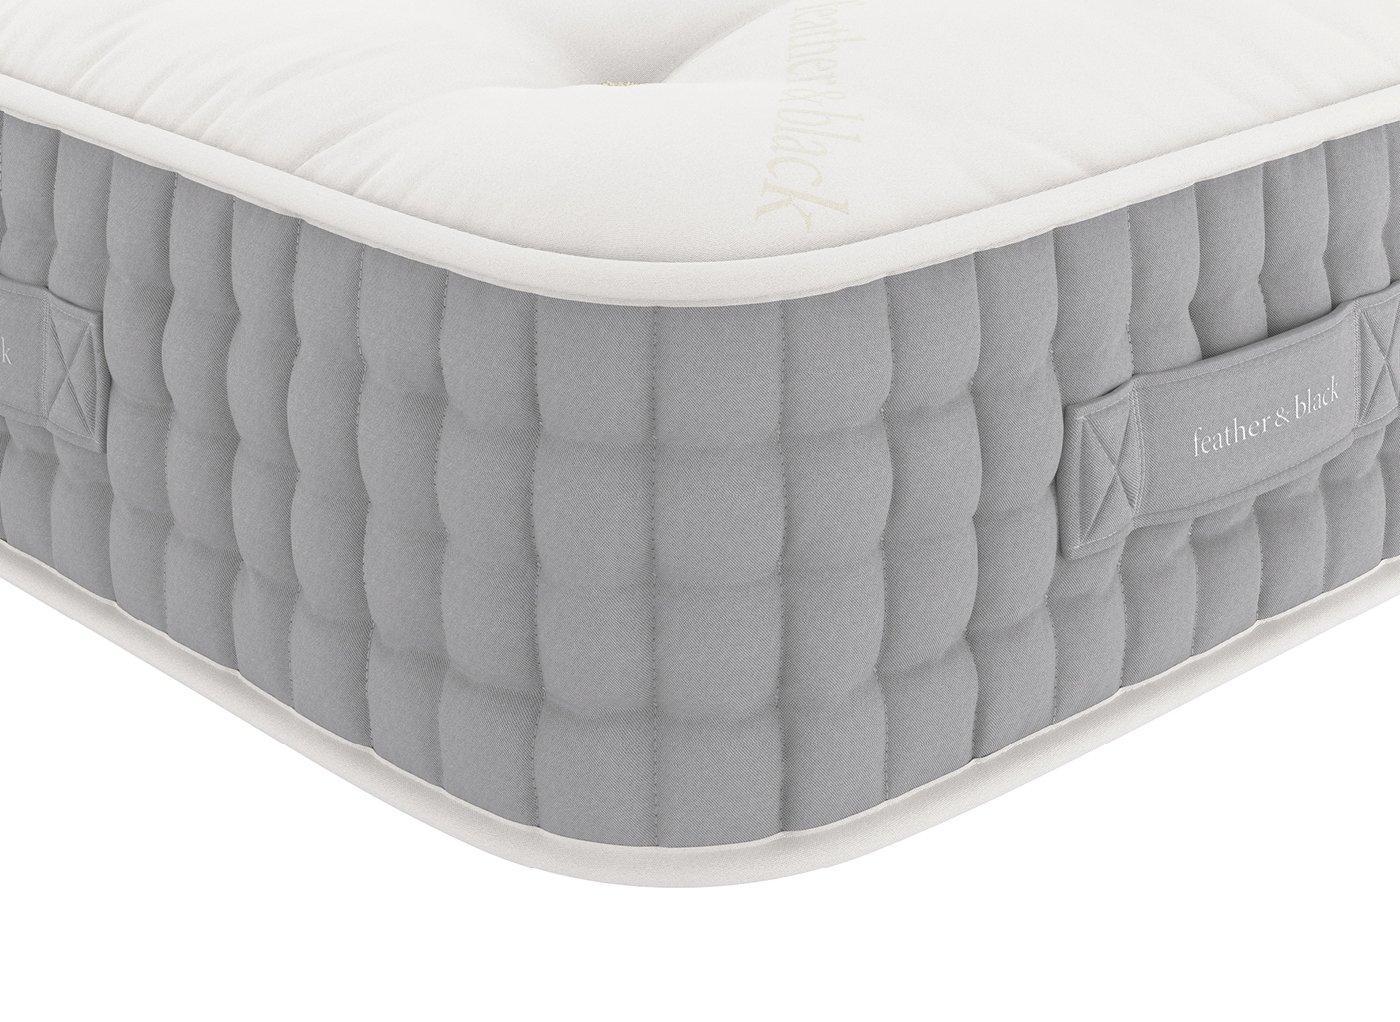 feather---black-hazelmere-pocket-spring-mattress